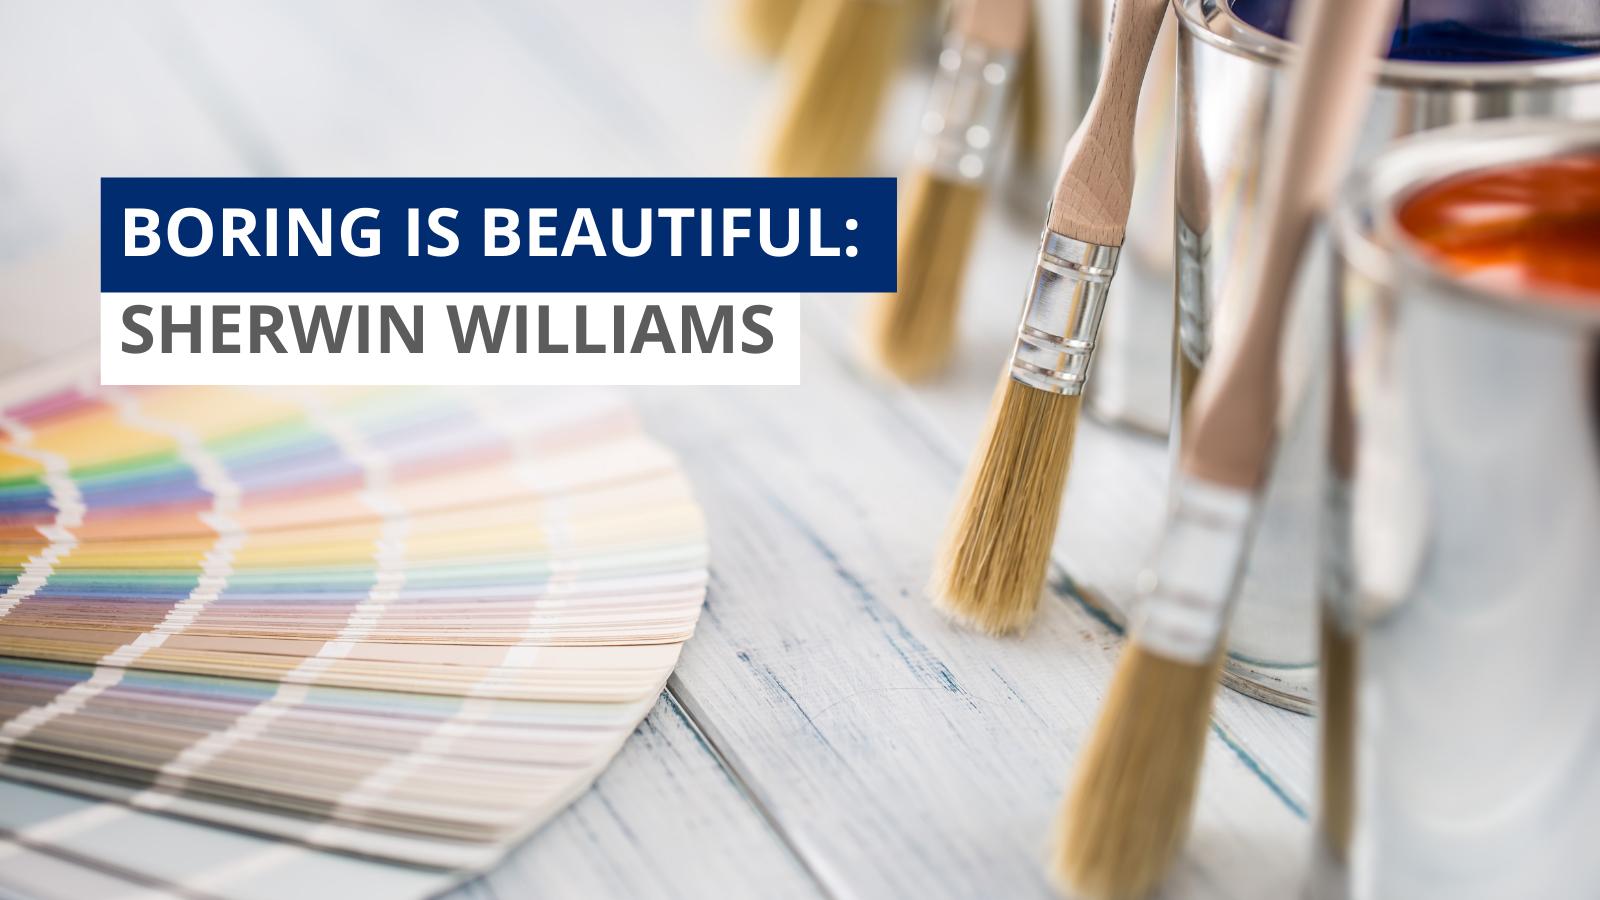 Boring is Beautiful: Sherwin Williams [Infographic] Thumbnail